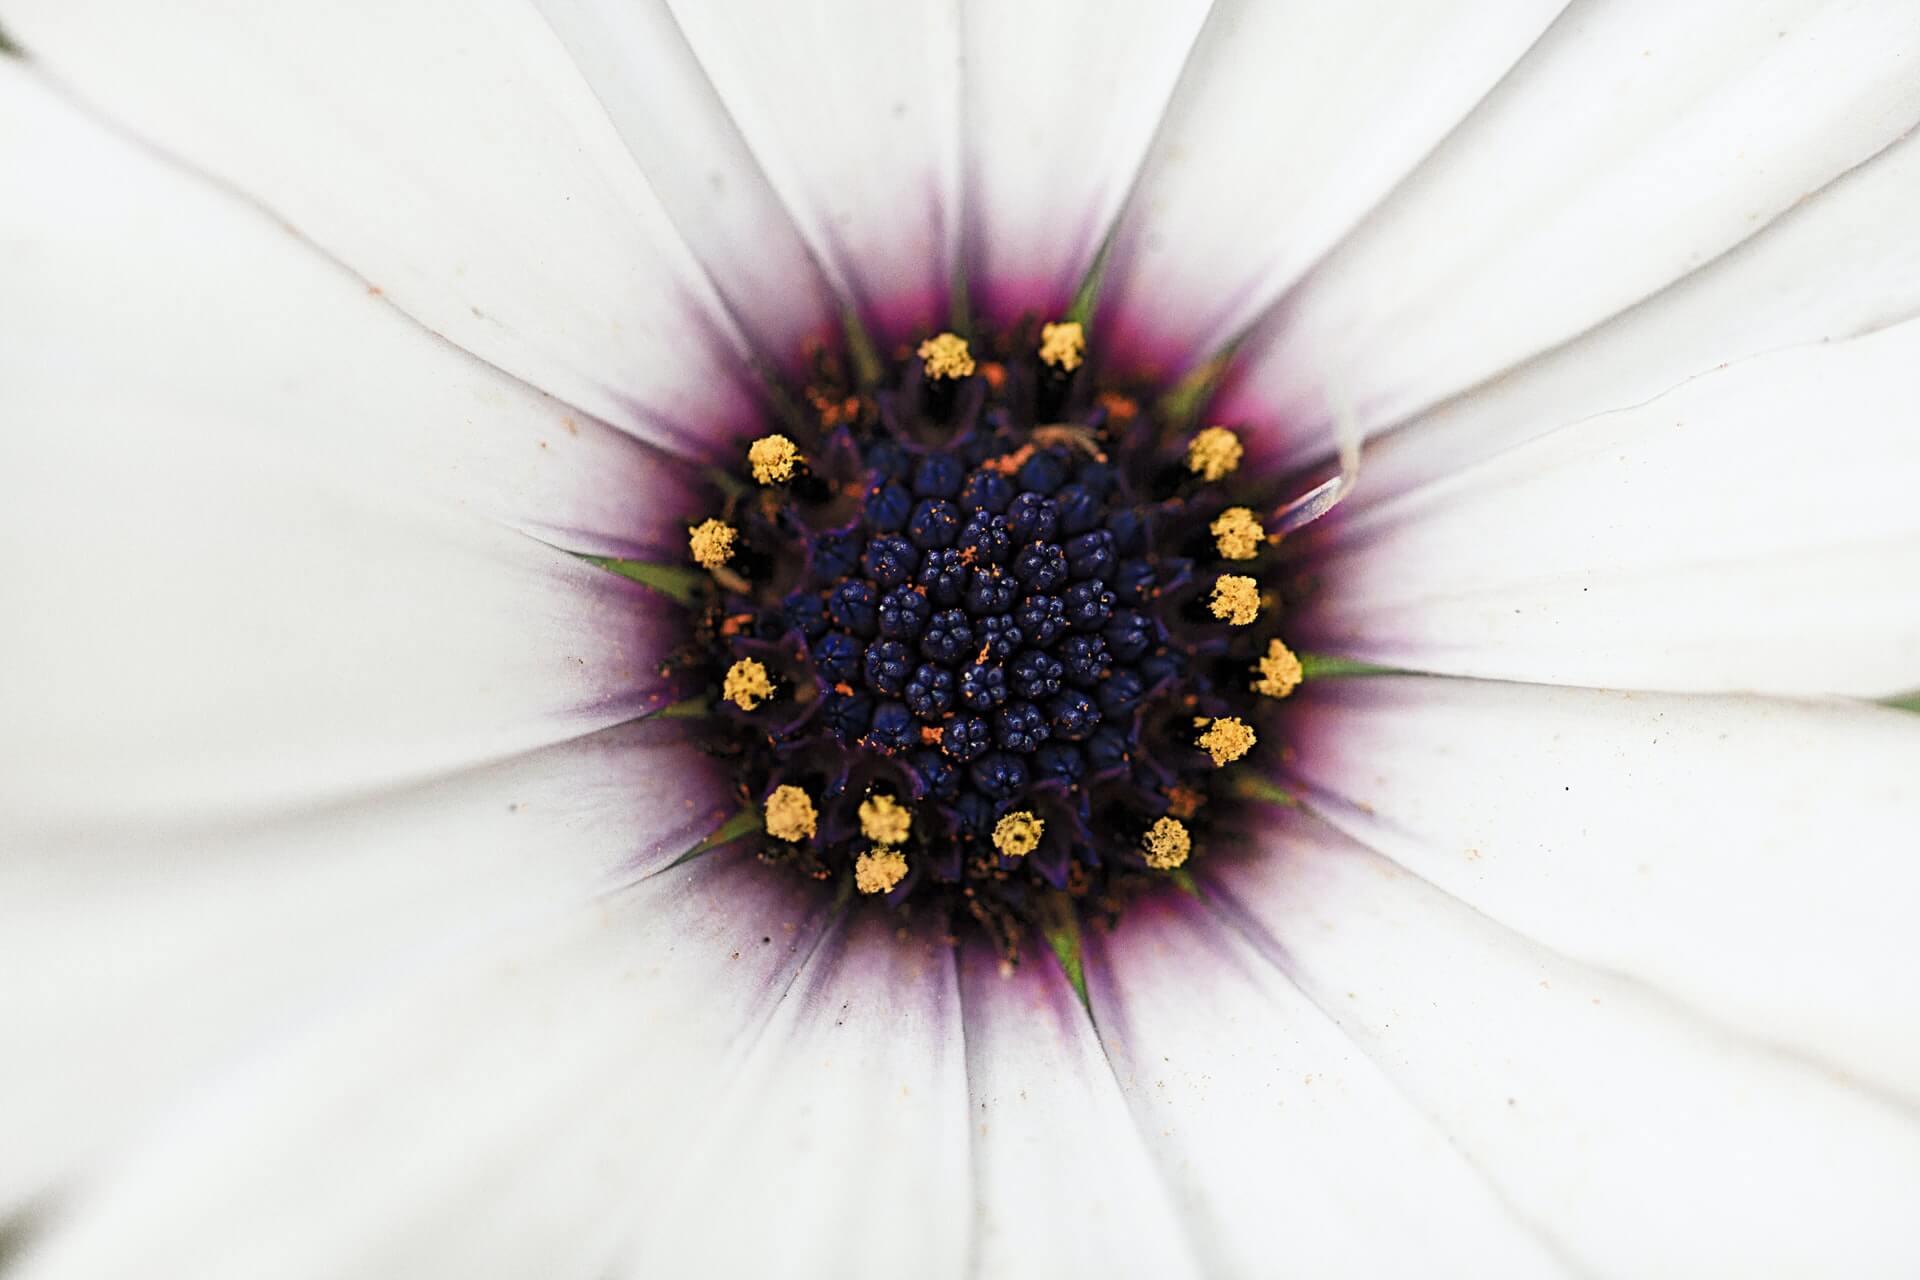 Domus Decorum Feng Shui Dizajn interijera Lana Anderson cvijet